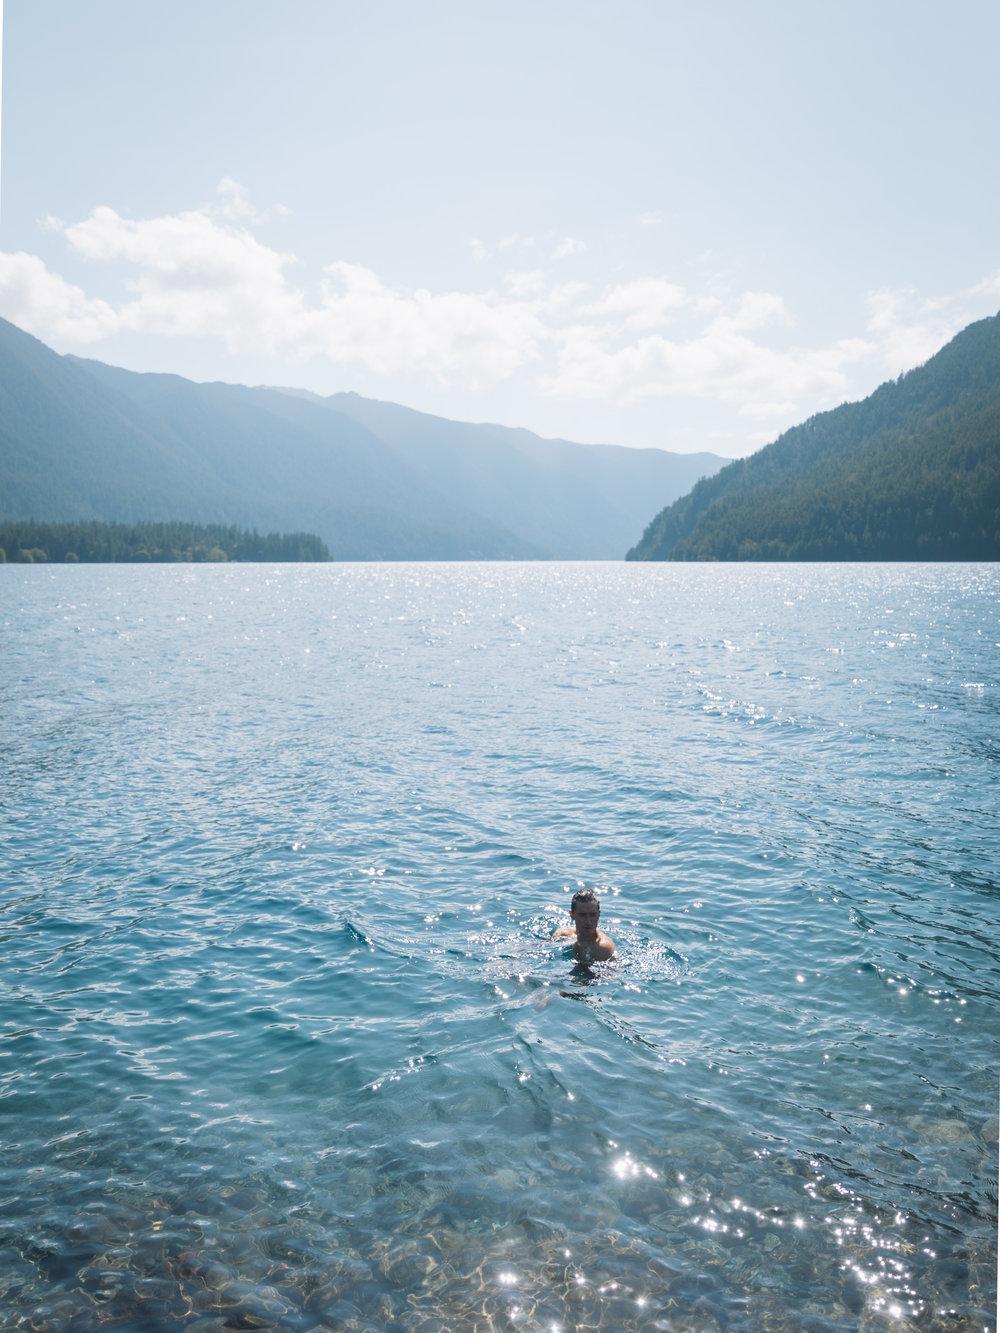 Taking a Dip  |7.1.17| Olympic National Park, Washington